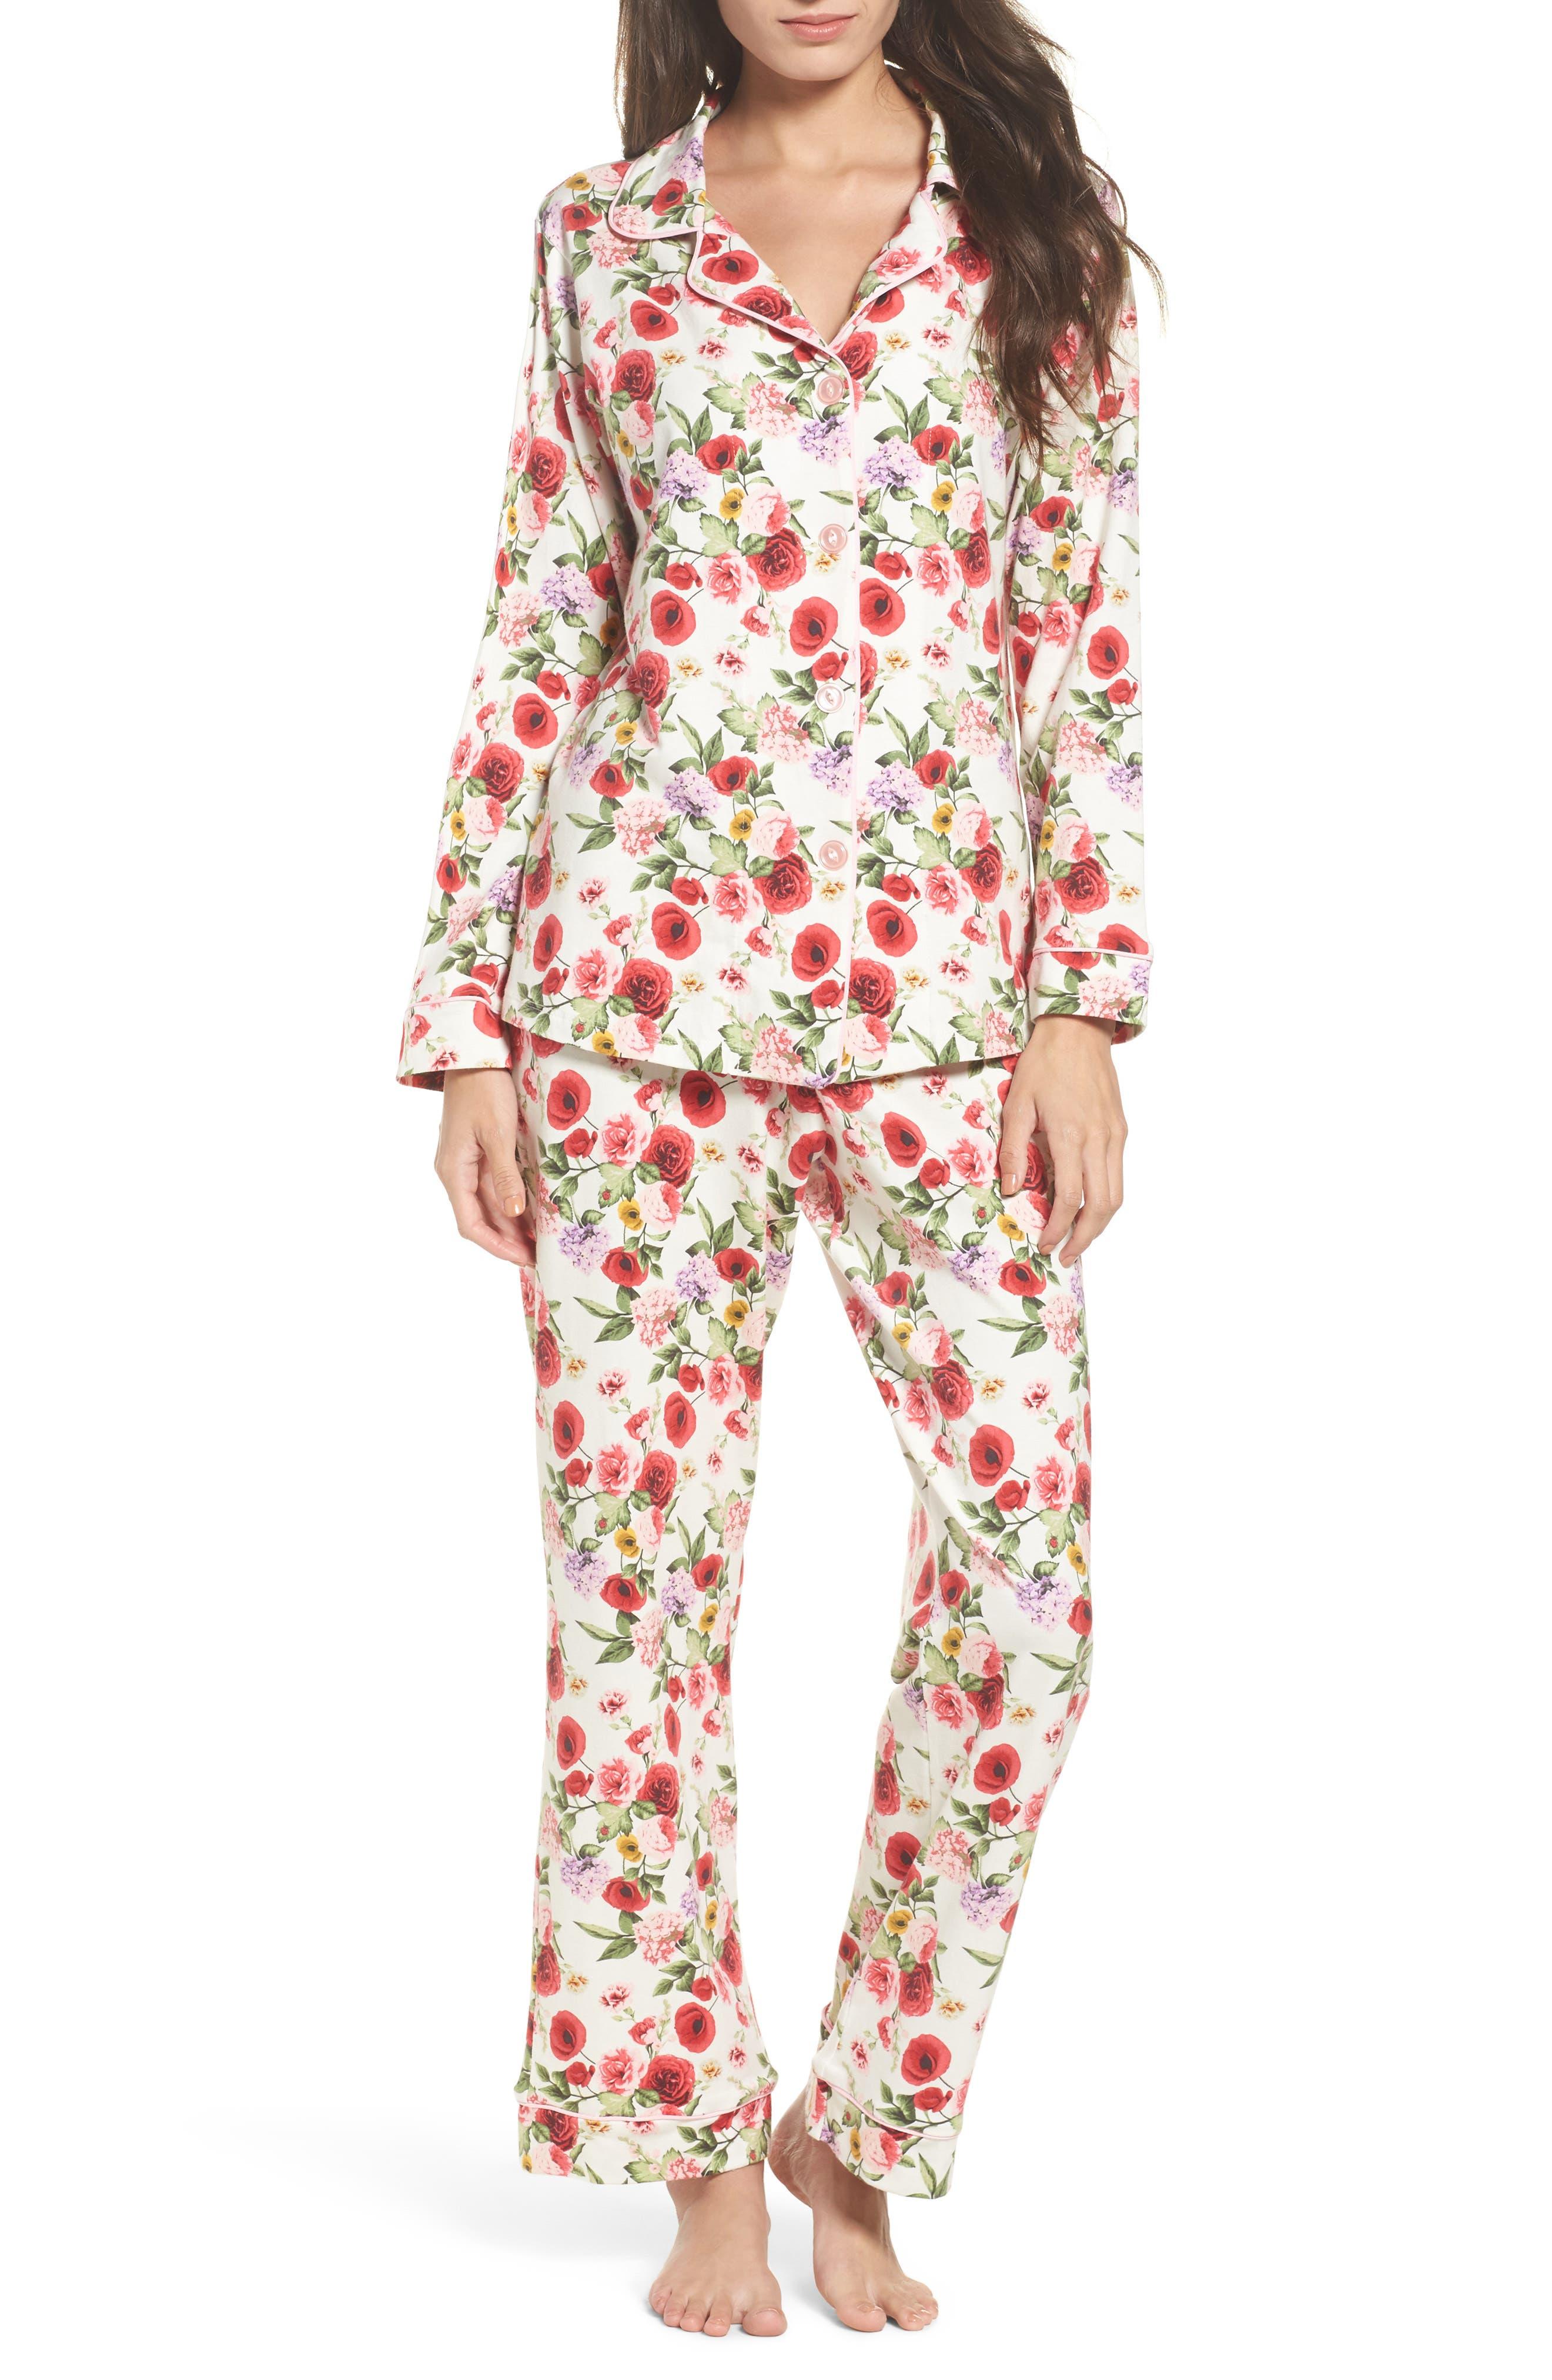 Flower Print Pajamas,                             Main thumbnail 1, color,                             Late Bloomers